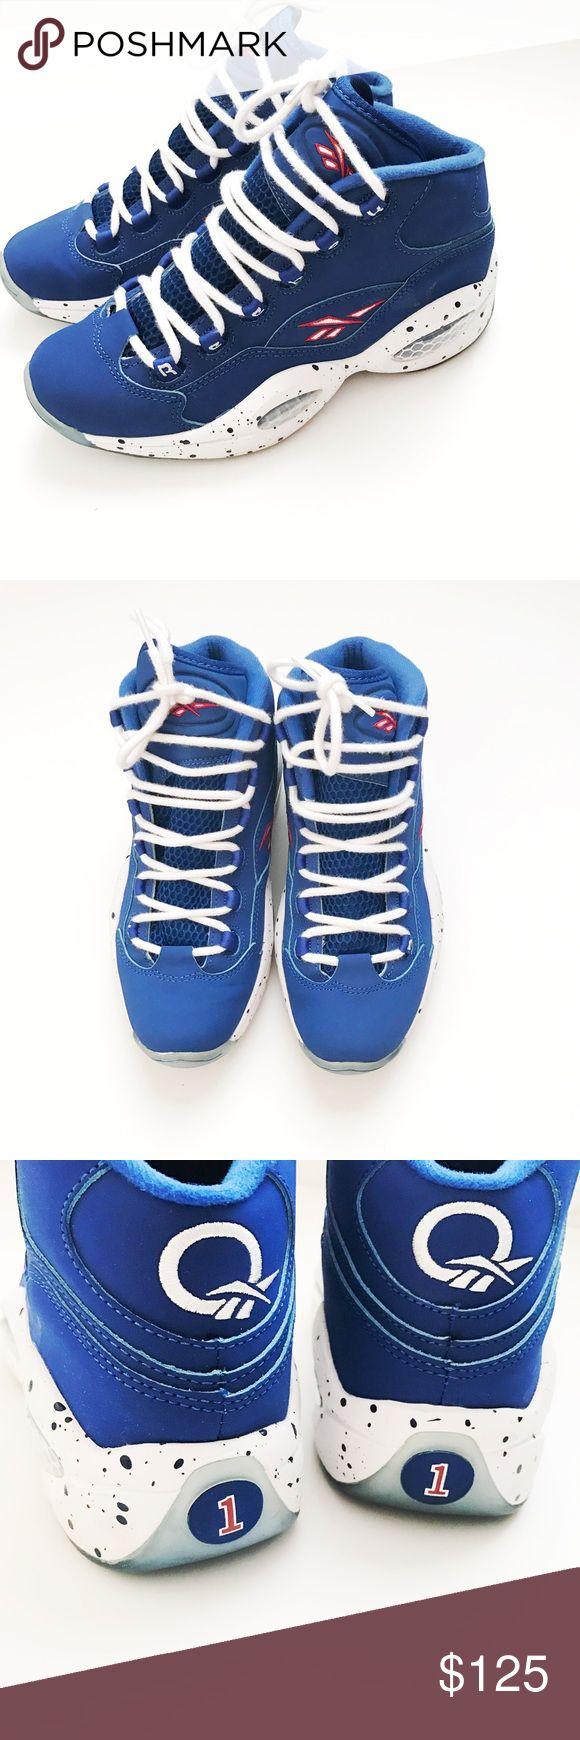 Reebok Allen Iverson Sneakers No trades Reebok Shoes Athletic Shoes